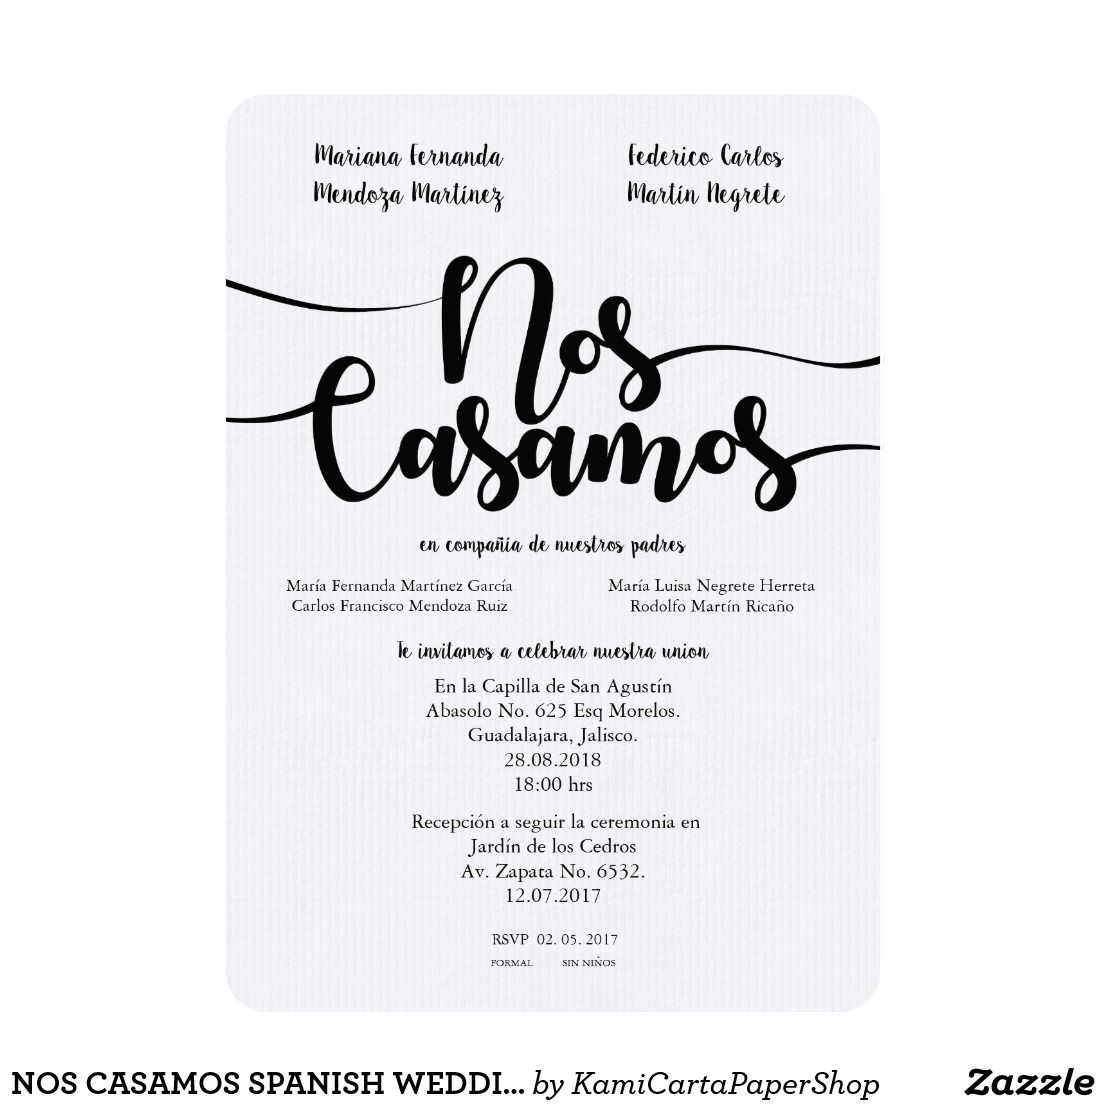 Wedding Invitations Spanish Wording: NOS CASAMOS SPANISH WEDDIN INVITATION